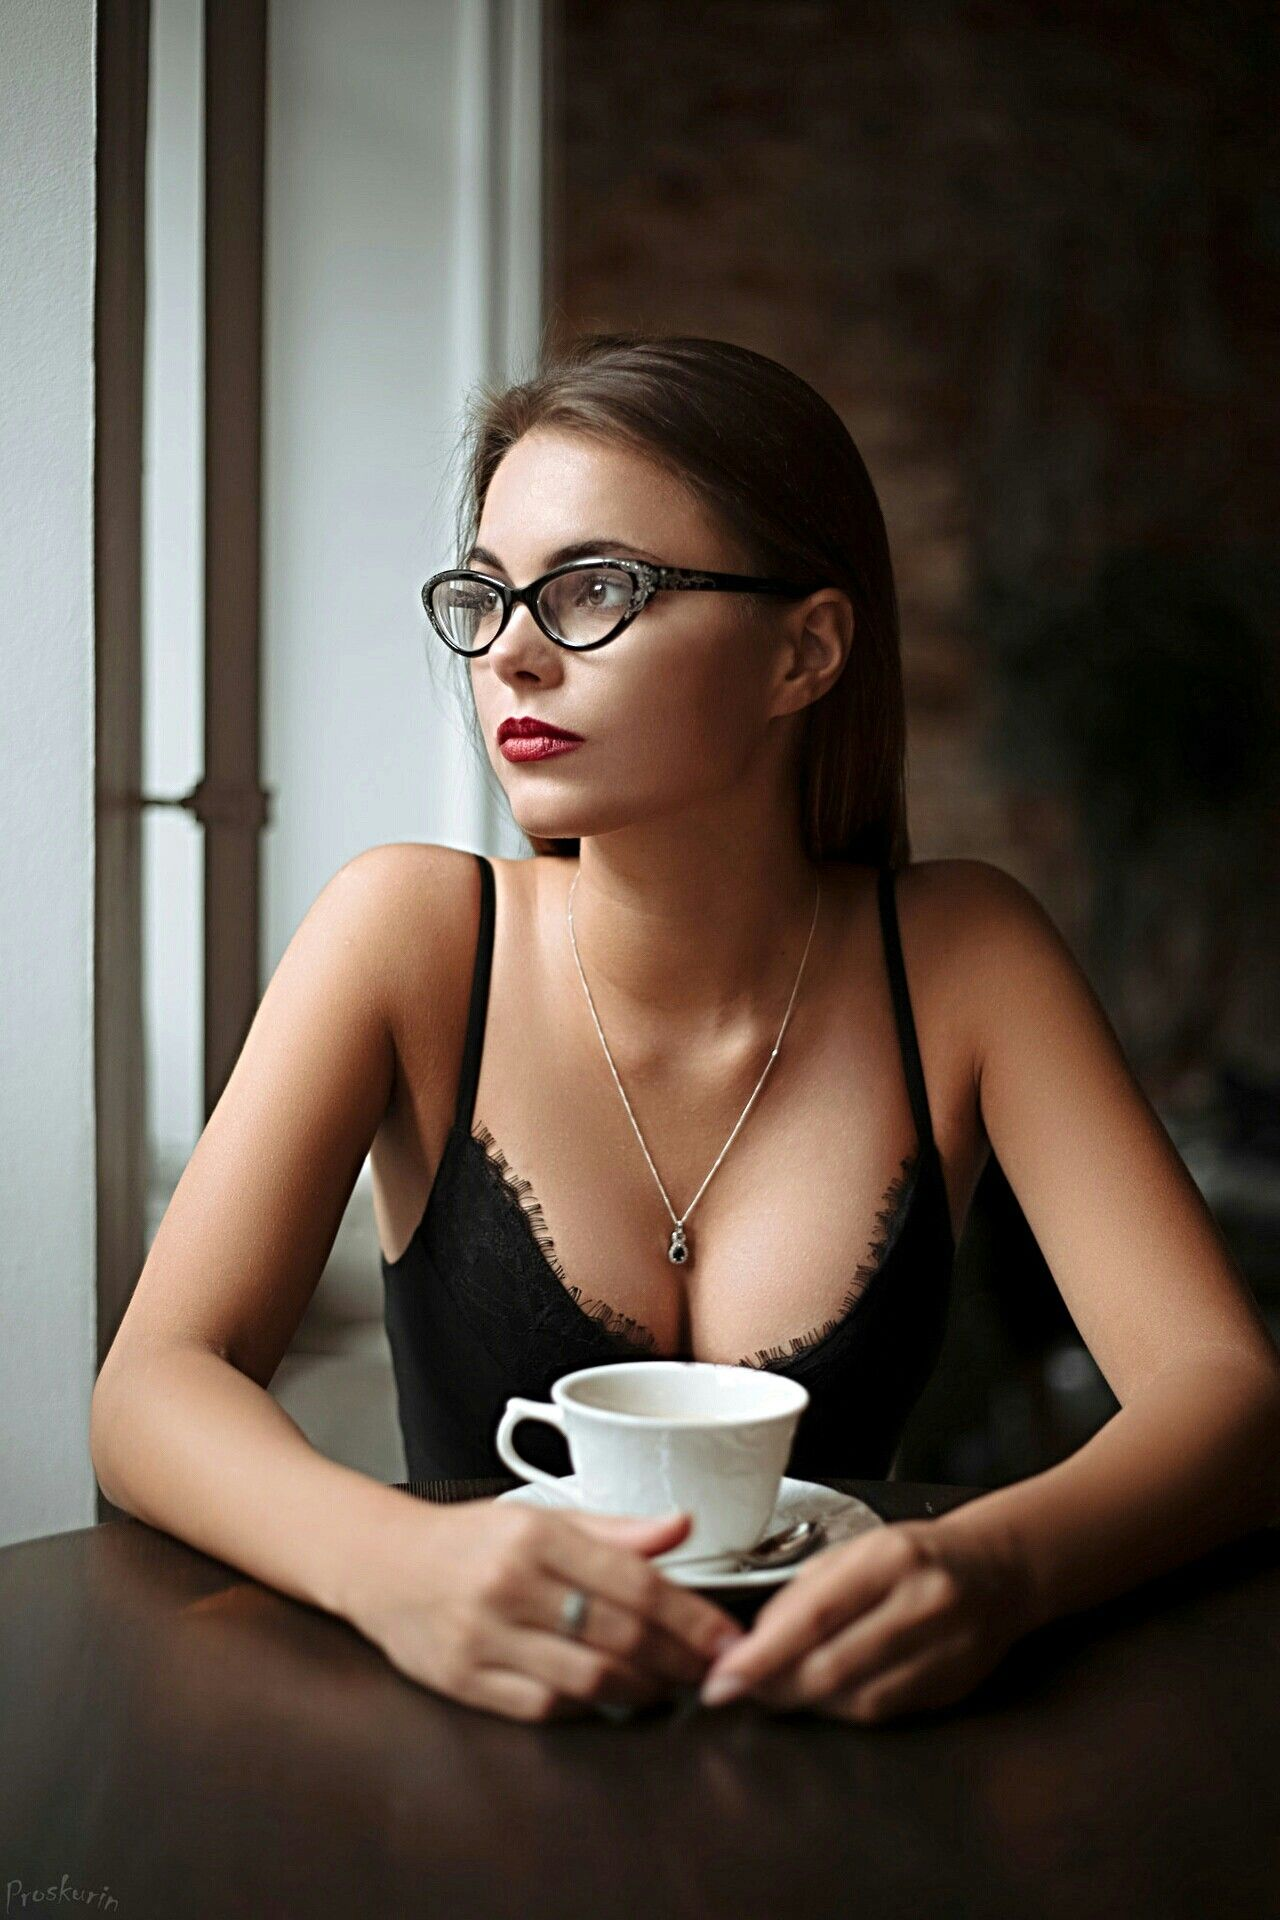 Pin by H. David MacIntosh on Coffee Club 25 Women